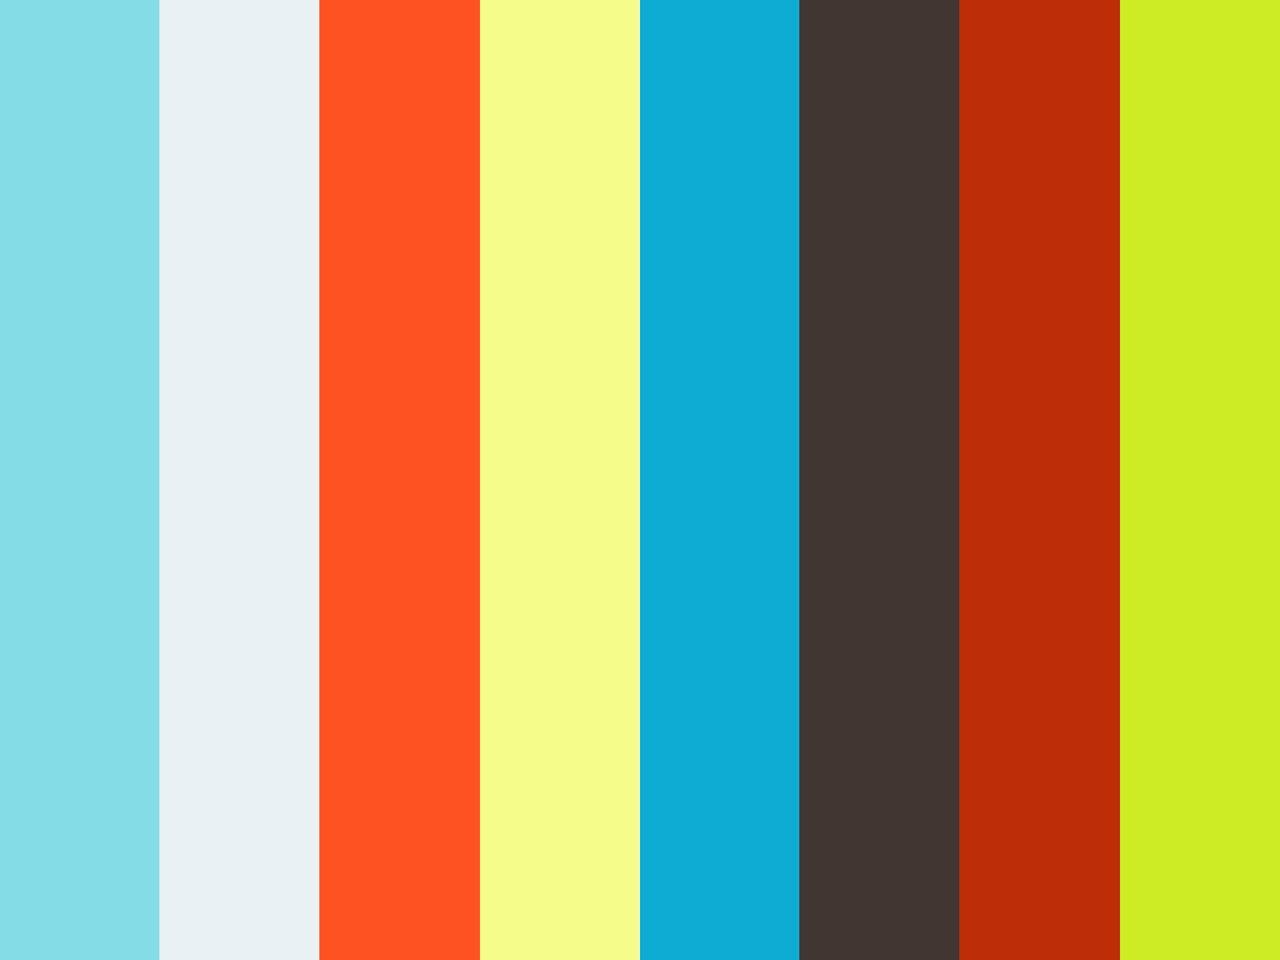 Earthshine Teaser - Life Steeze Media 2013